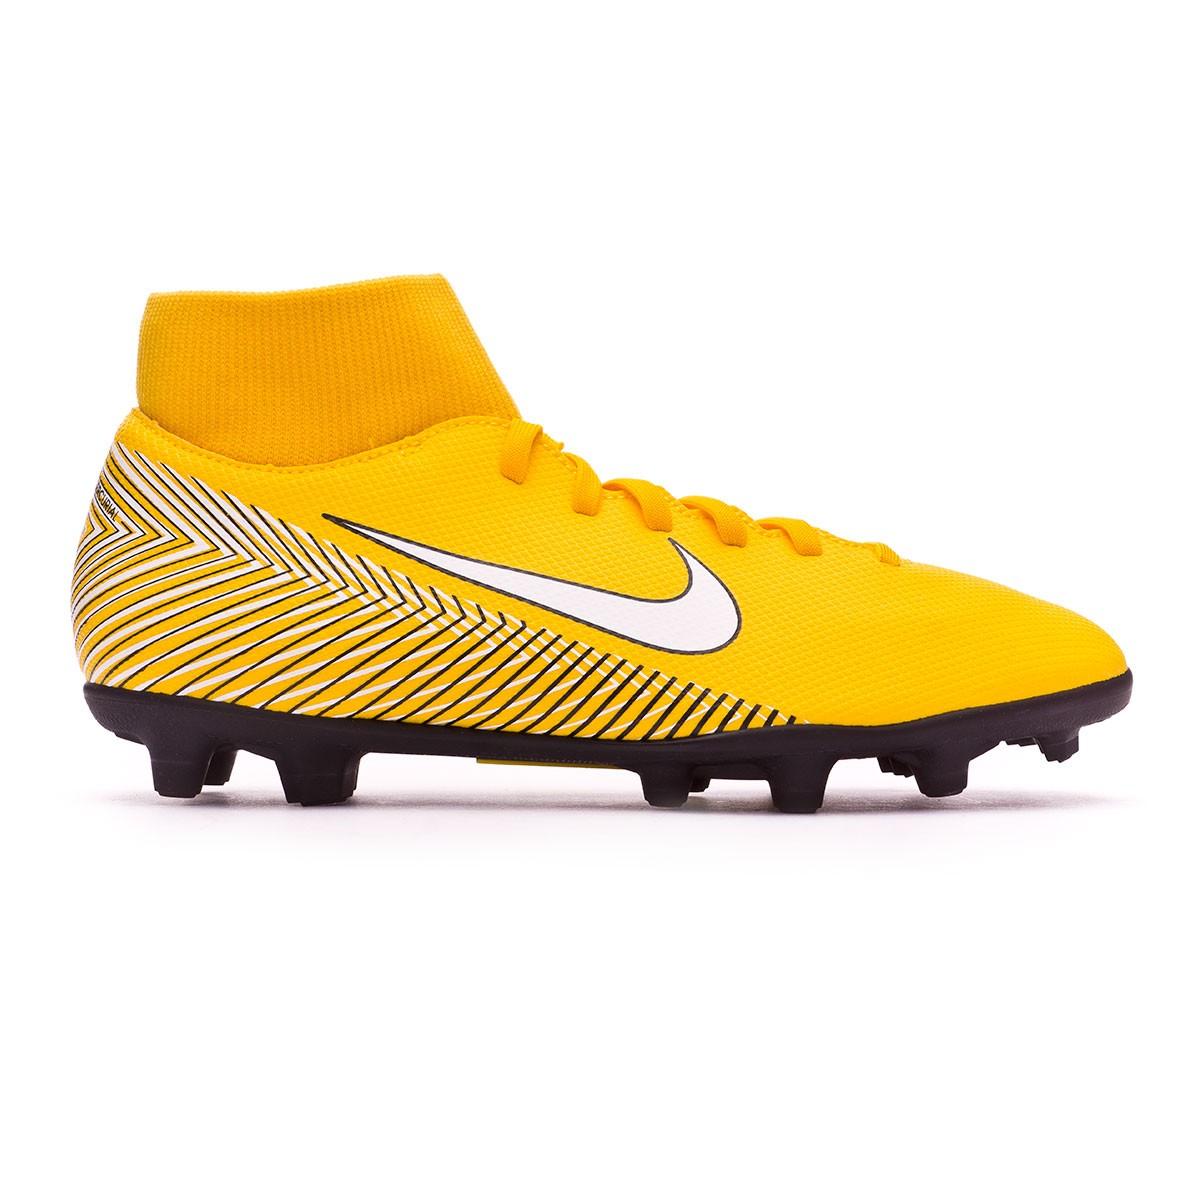 3bb3b10d544a Football Boots Nike Mercurial Superfly VI Club MG Neymar Yellow-Black -  Football store Fútbol Emotion